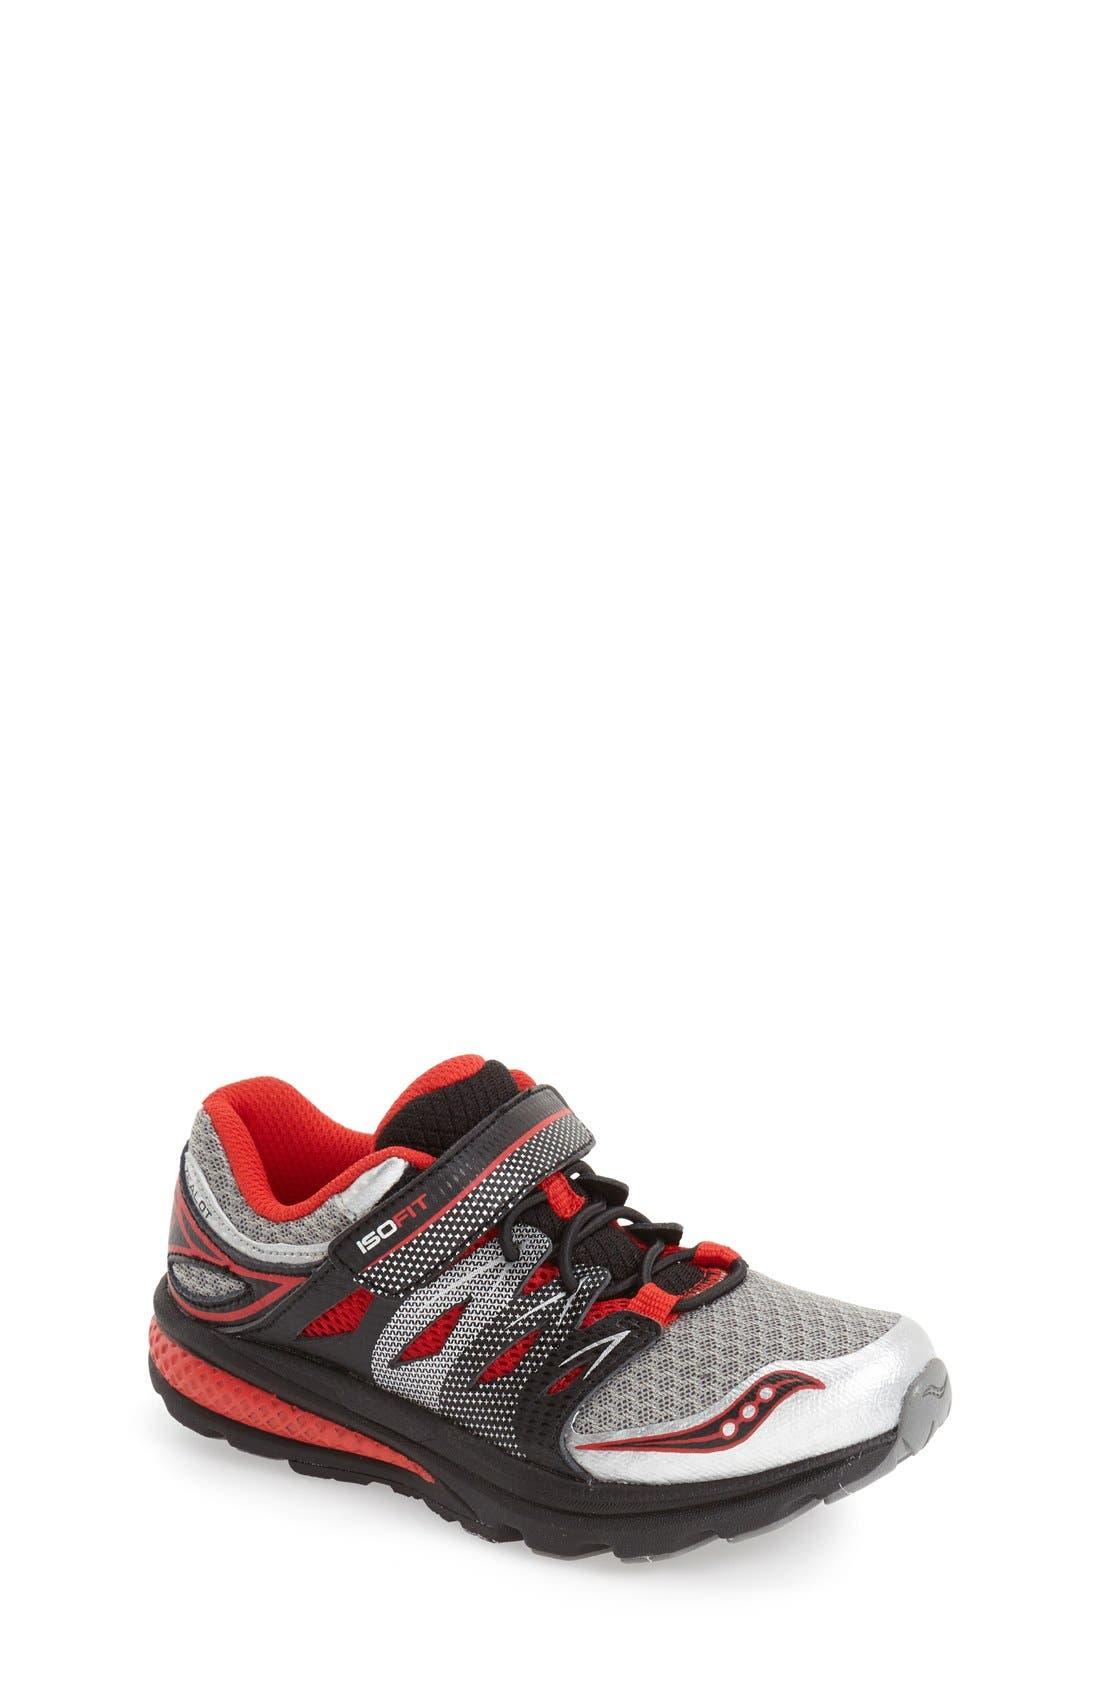 'Zealot 2 AC' Running Shoe,                             Main thumbnail 1, color,                             020